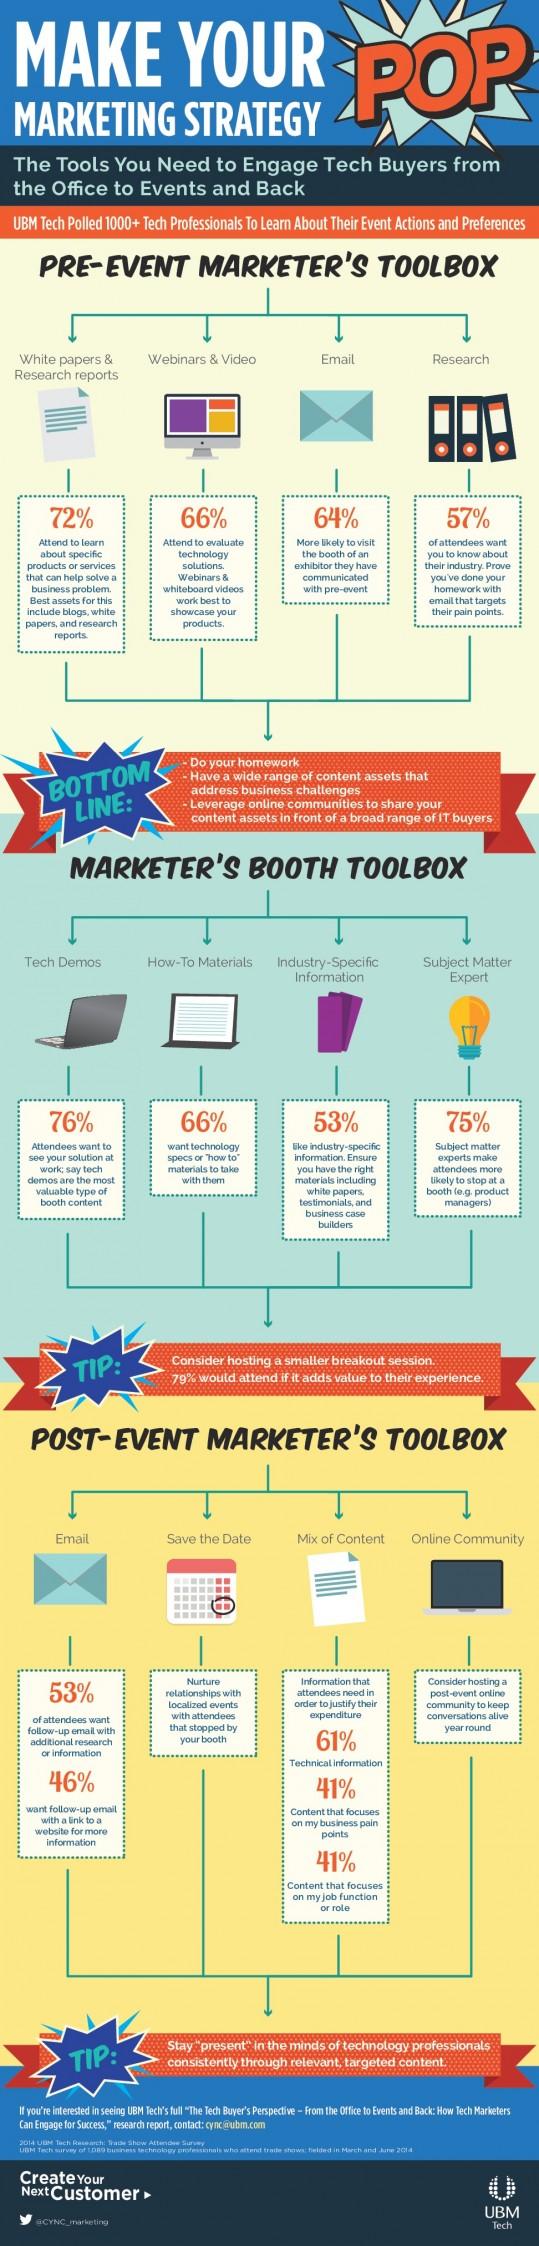 Make-Your-Marketing-Strategy-POP